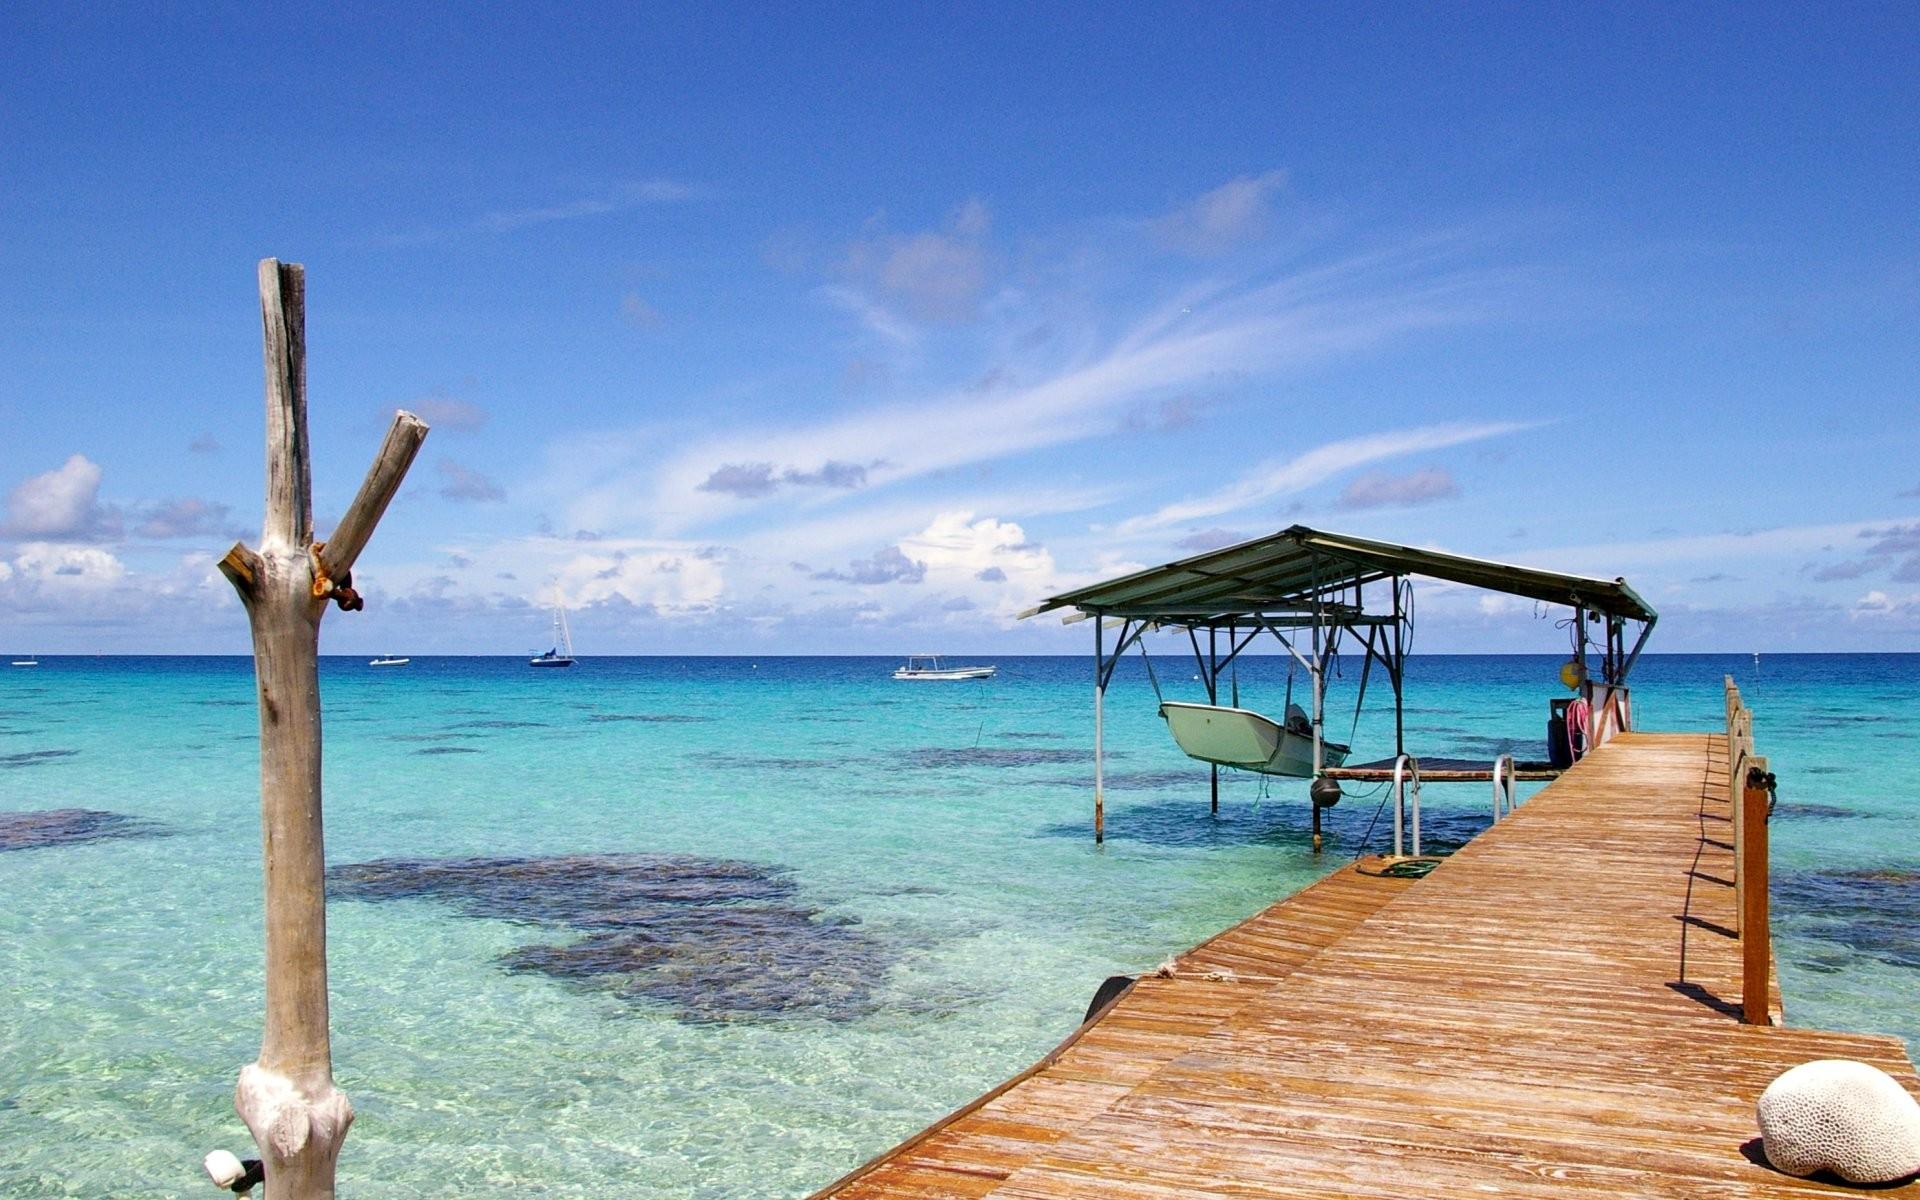 1920x1200 Beach HD Wallpaper | ImageBank.biz · Download · tropical beach hd ...